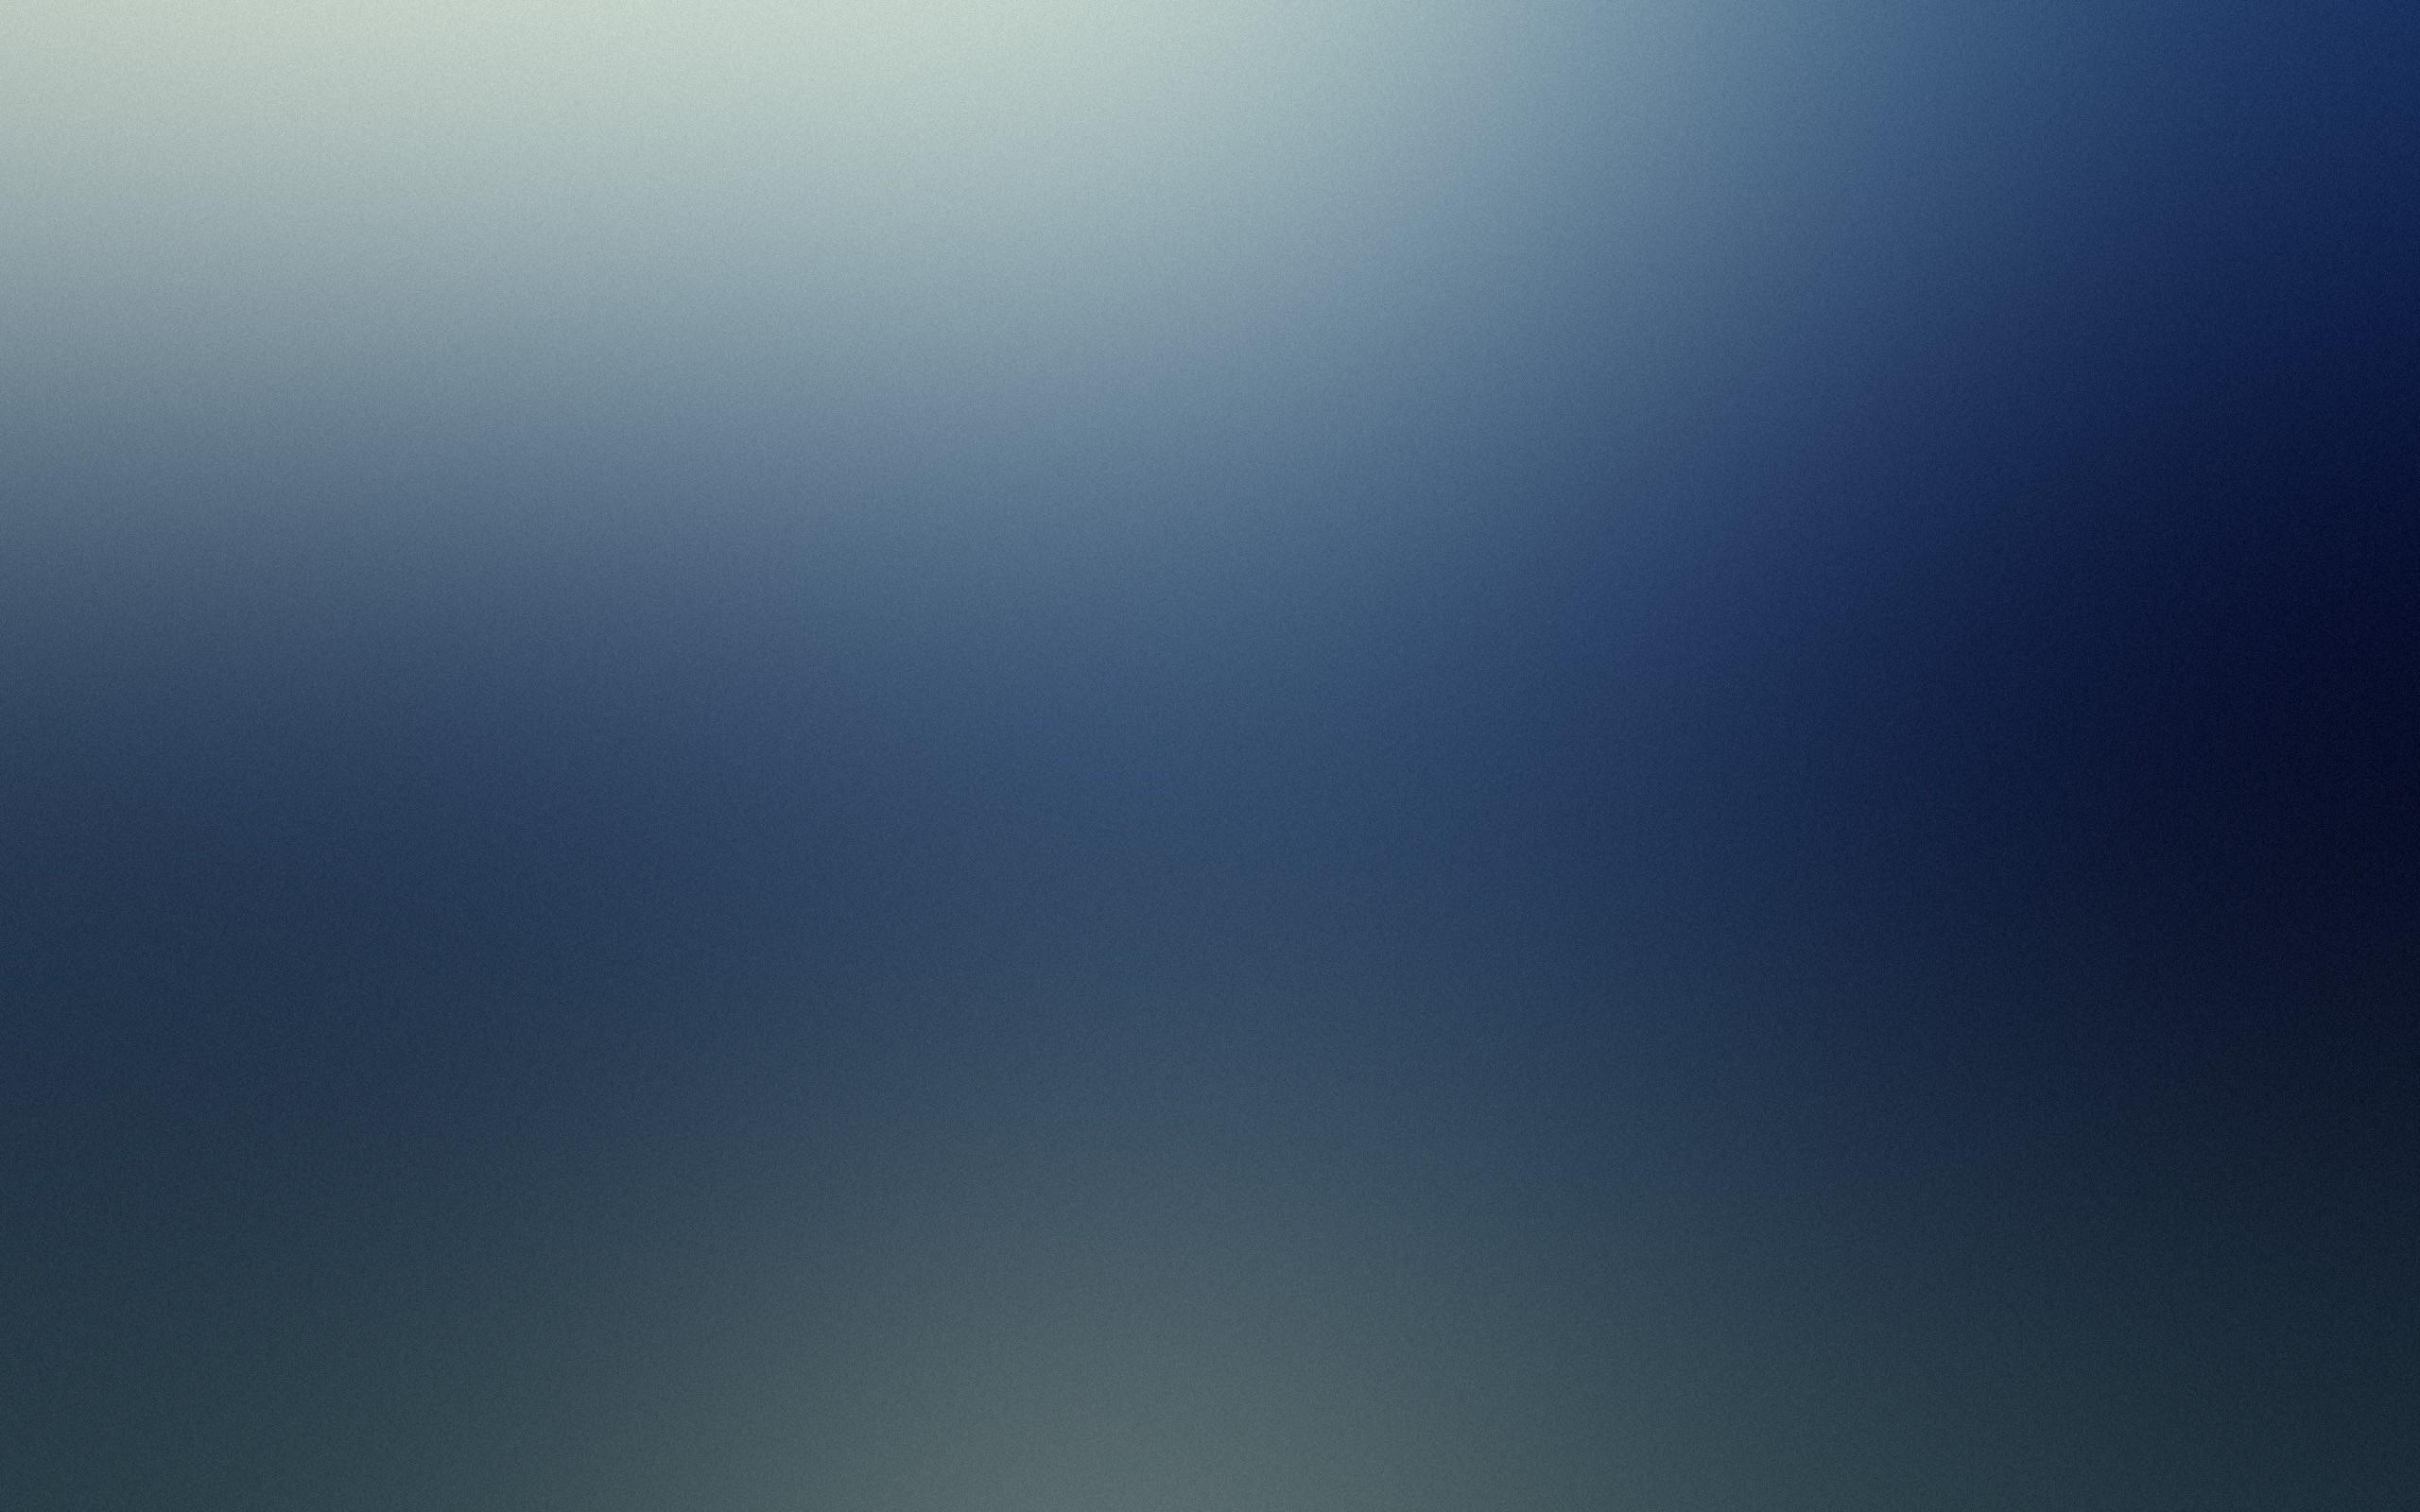 Best Wallpaper Mac Blue - c3033864a979f67e438e5b4d255c1a5f  HD_303771.jpg